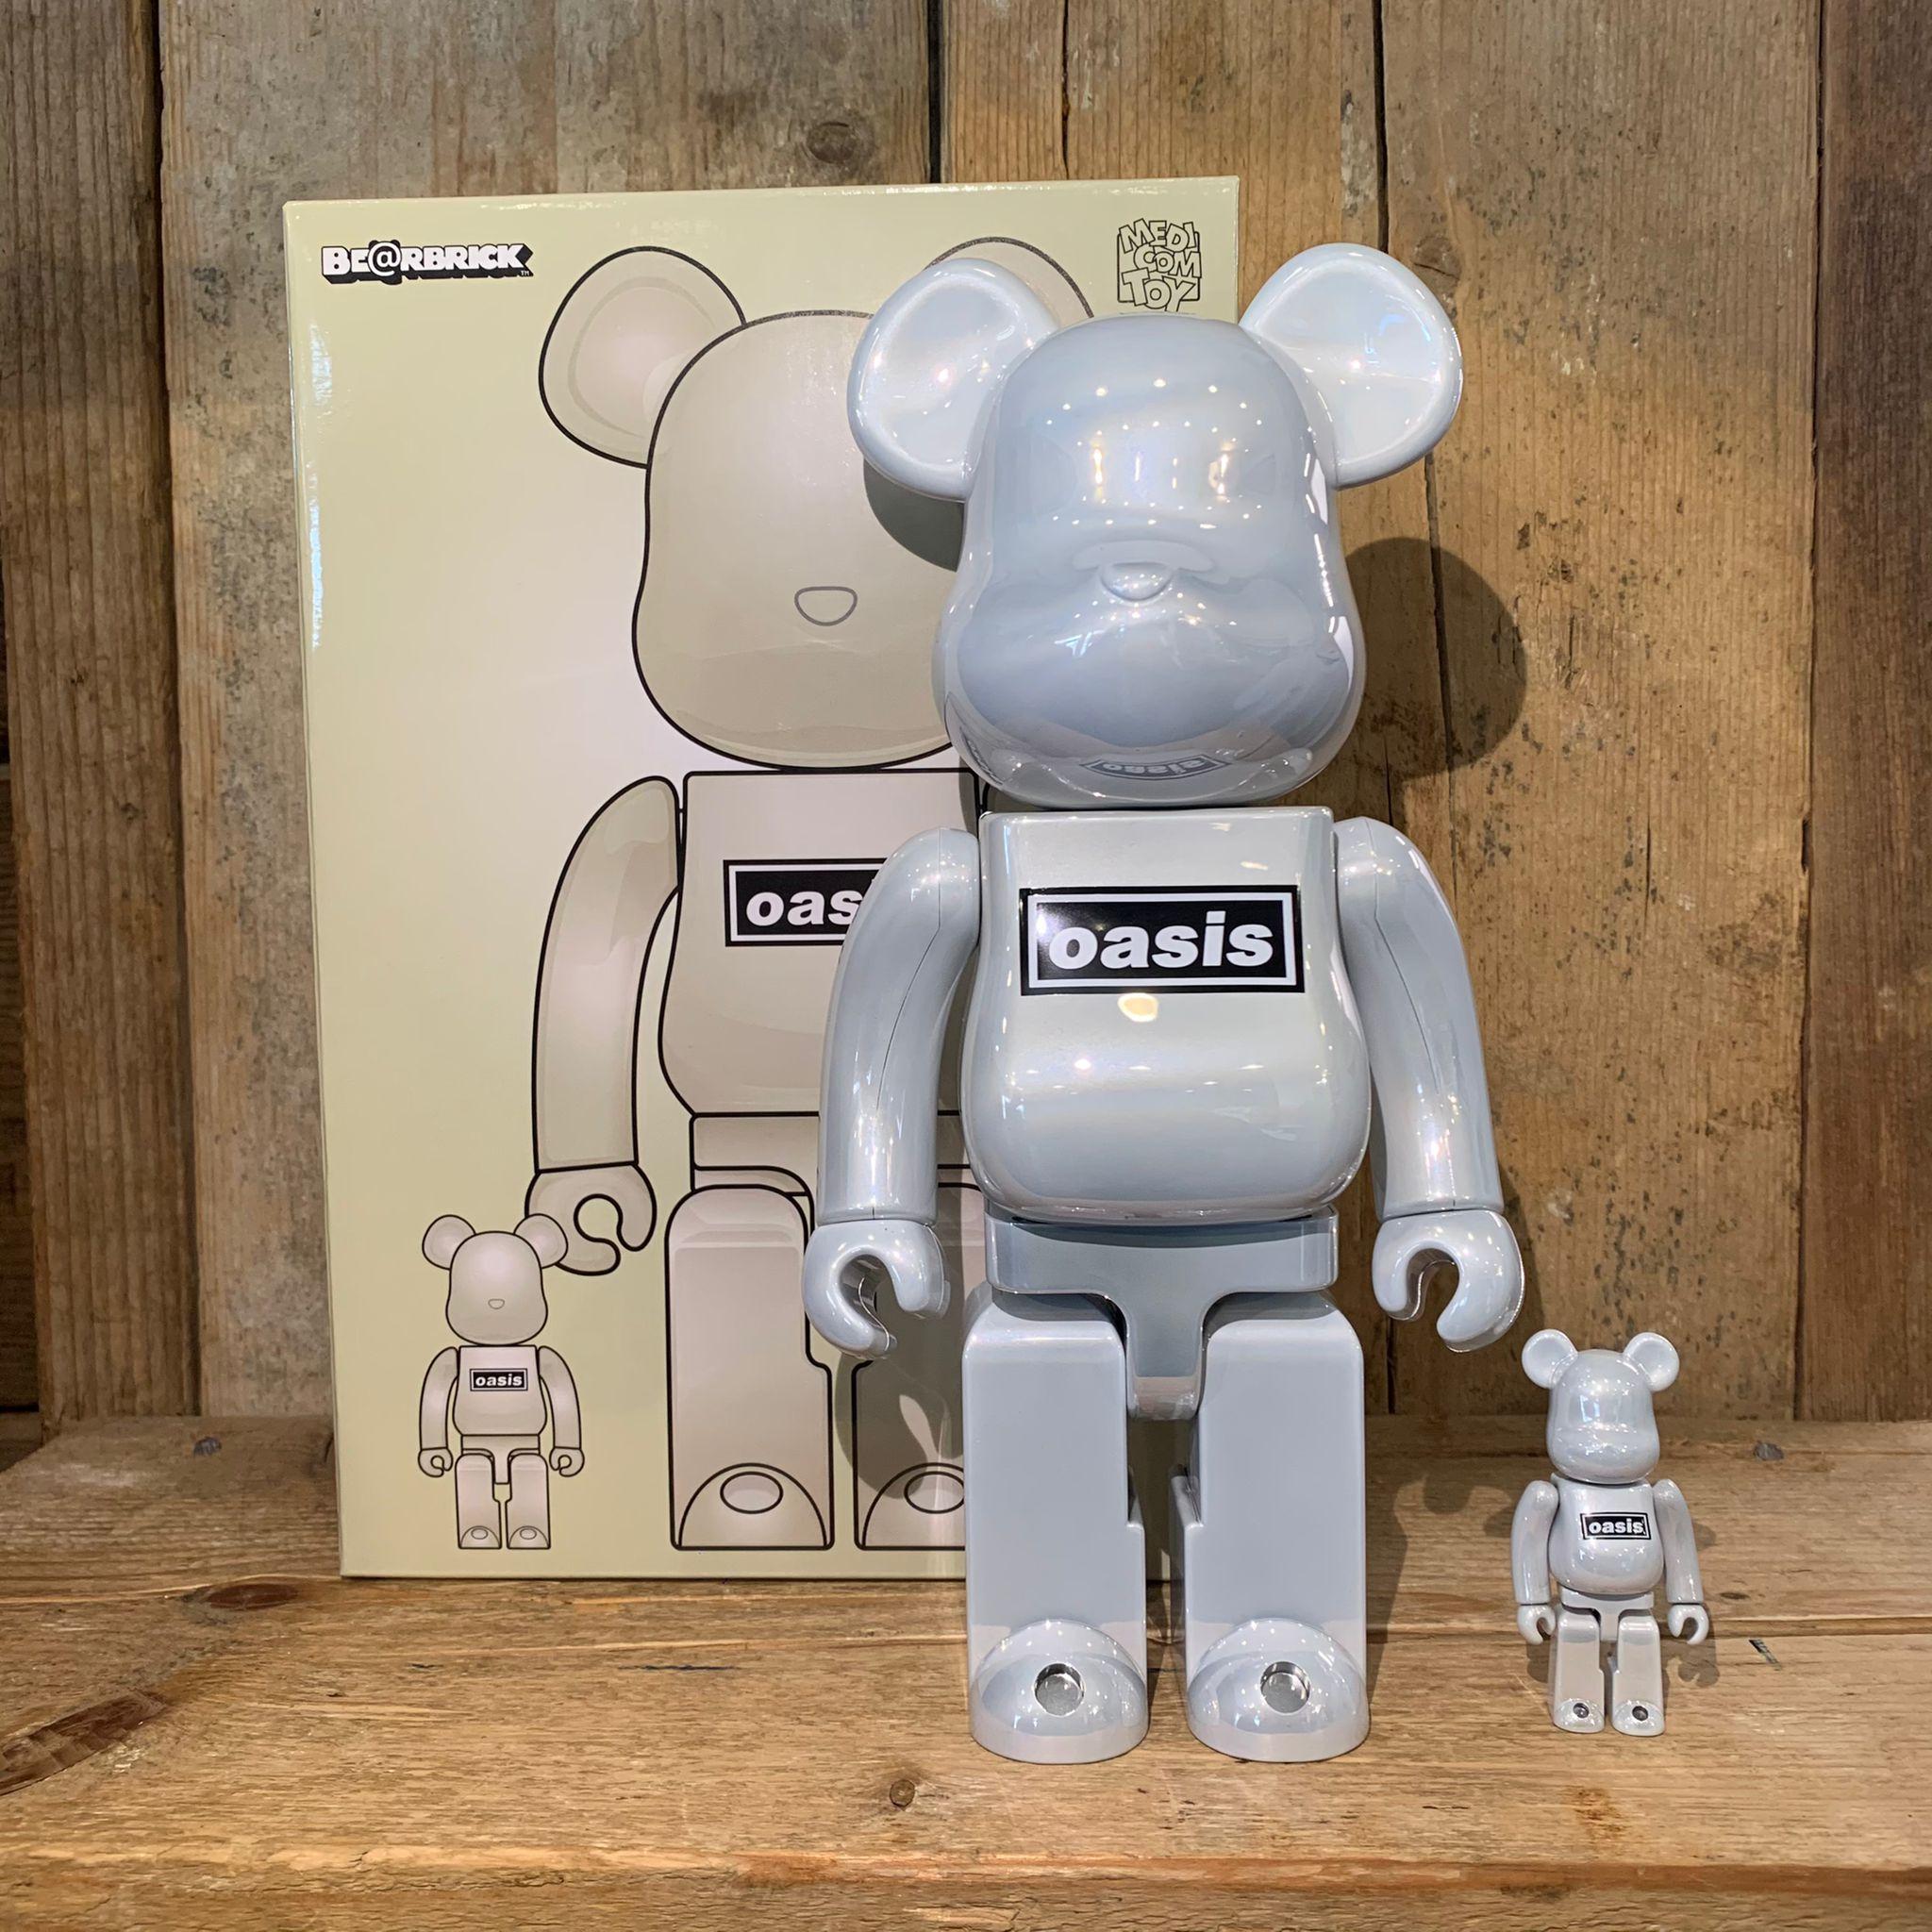 Be@rbrick Medicom Toy Oasis 100% & 400% White Chrome